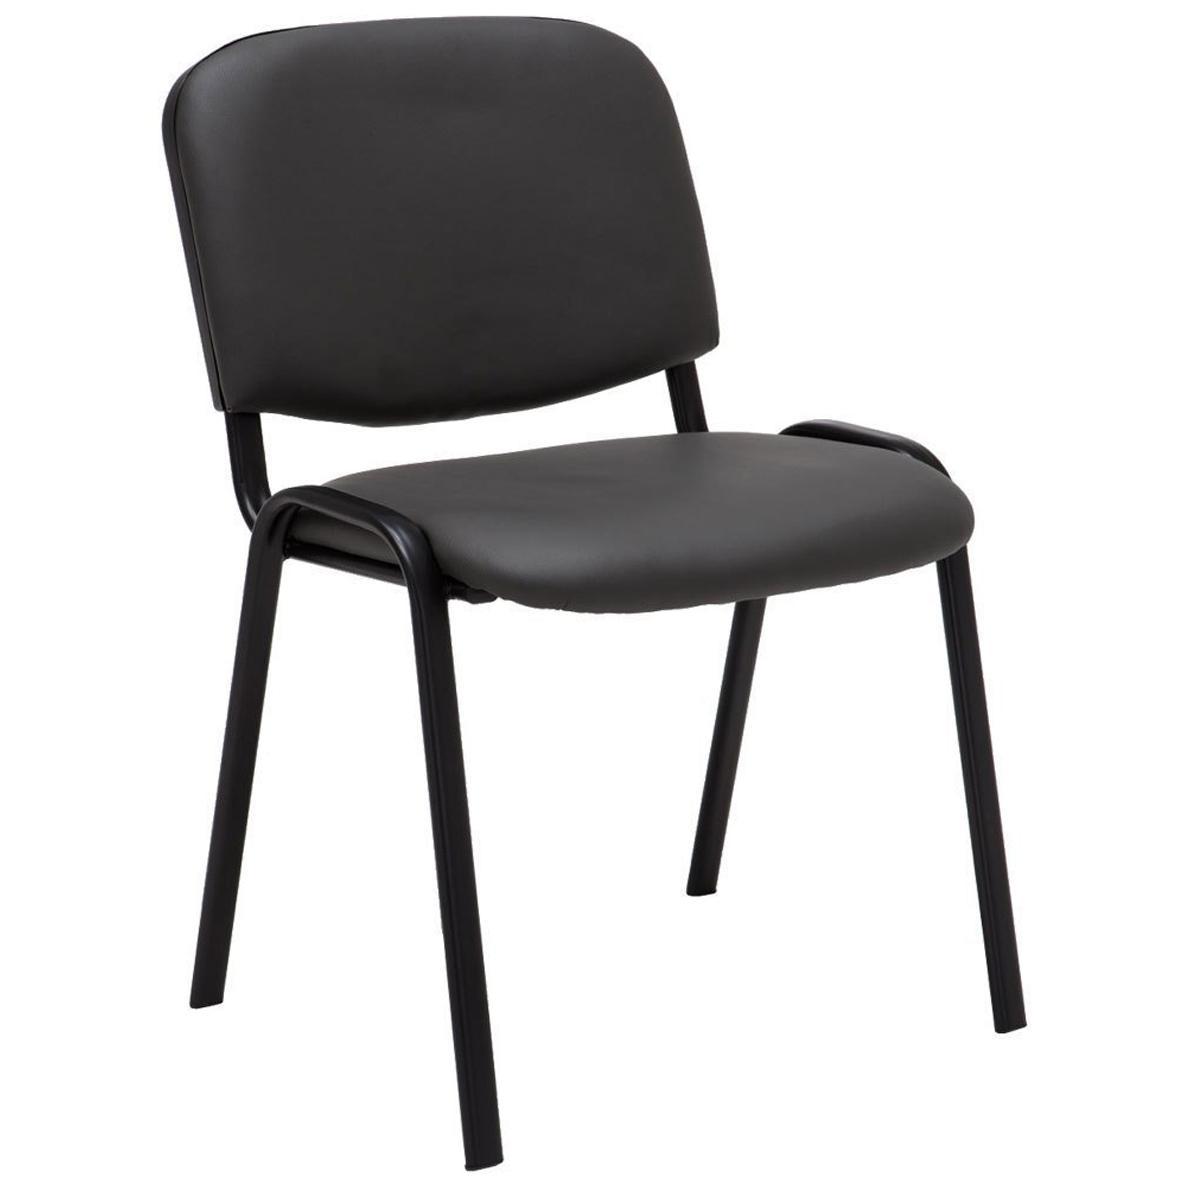 Silla de confidente moby piel gris patas negras silla for Sillas color gris